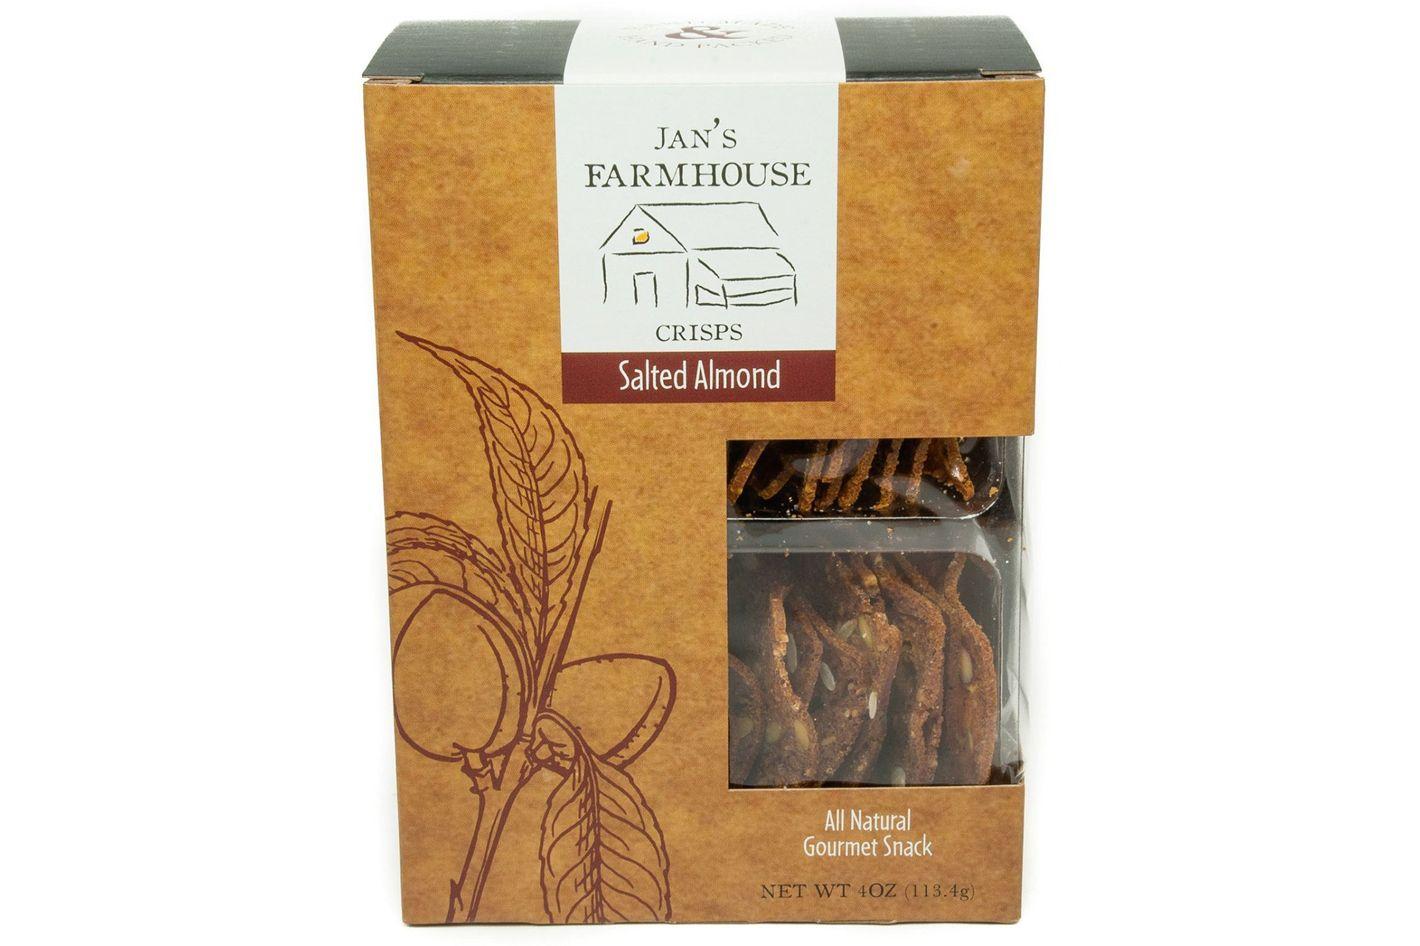 Jan's Farmhouse Crackers